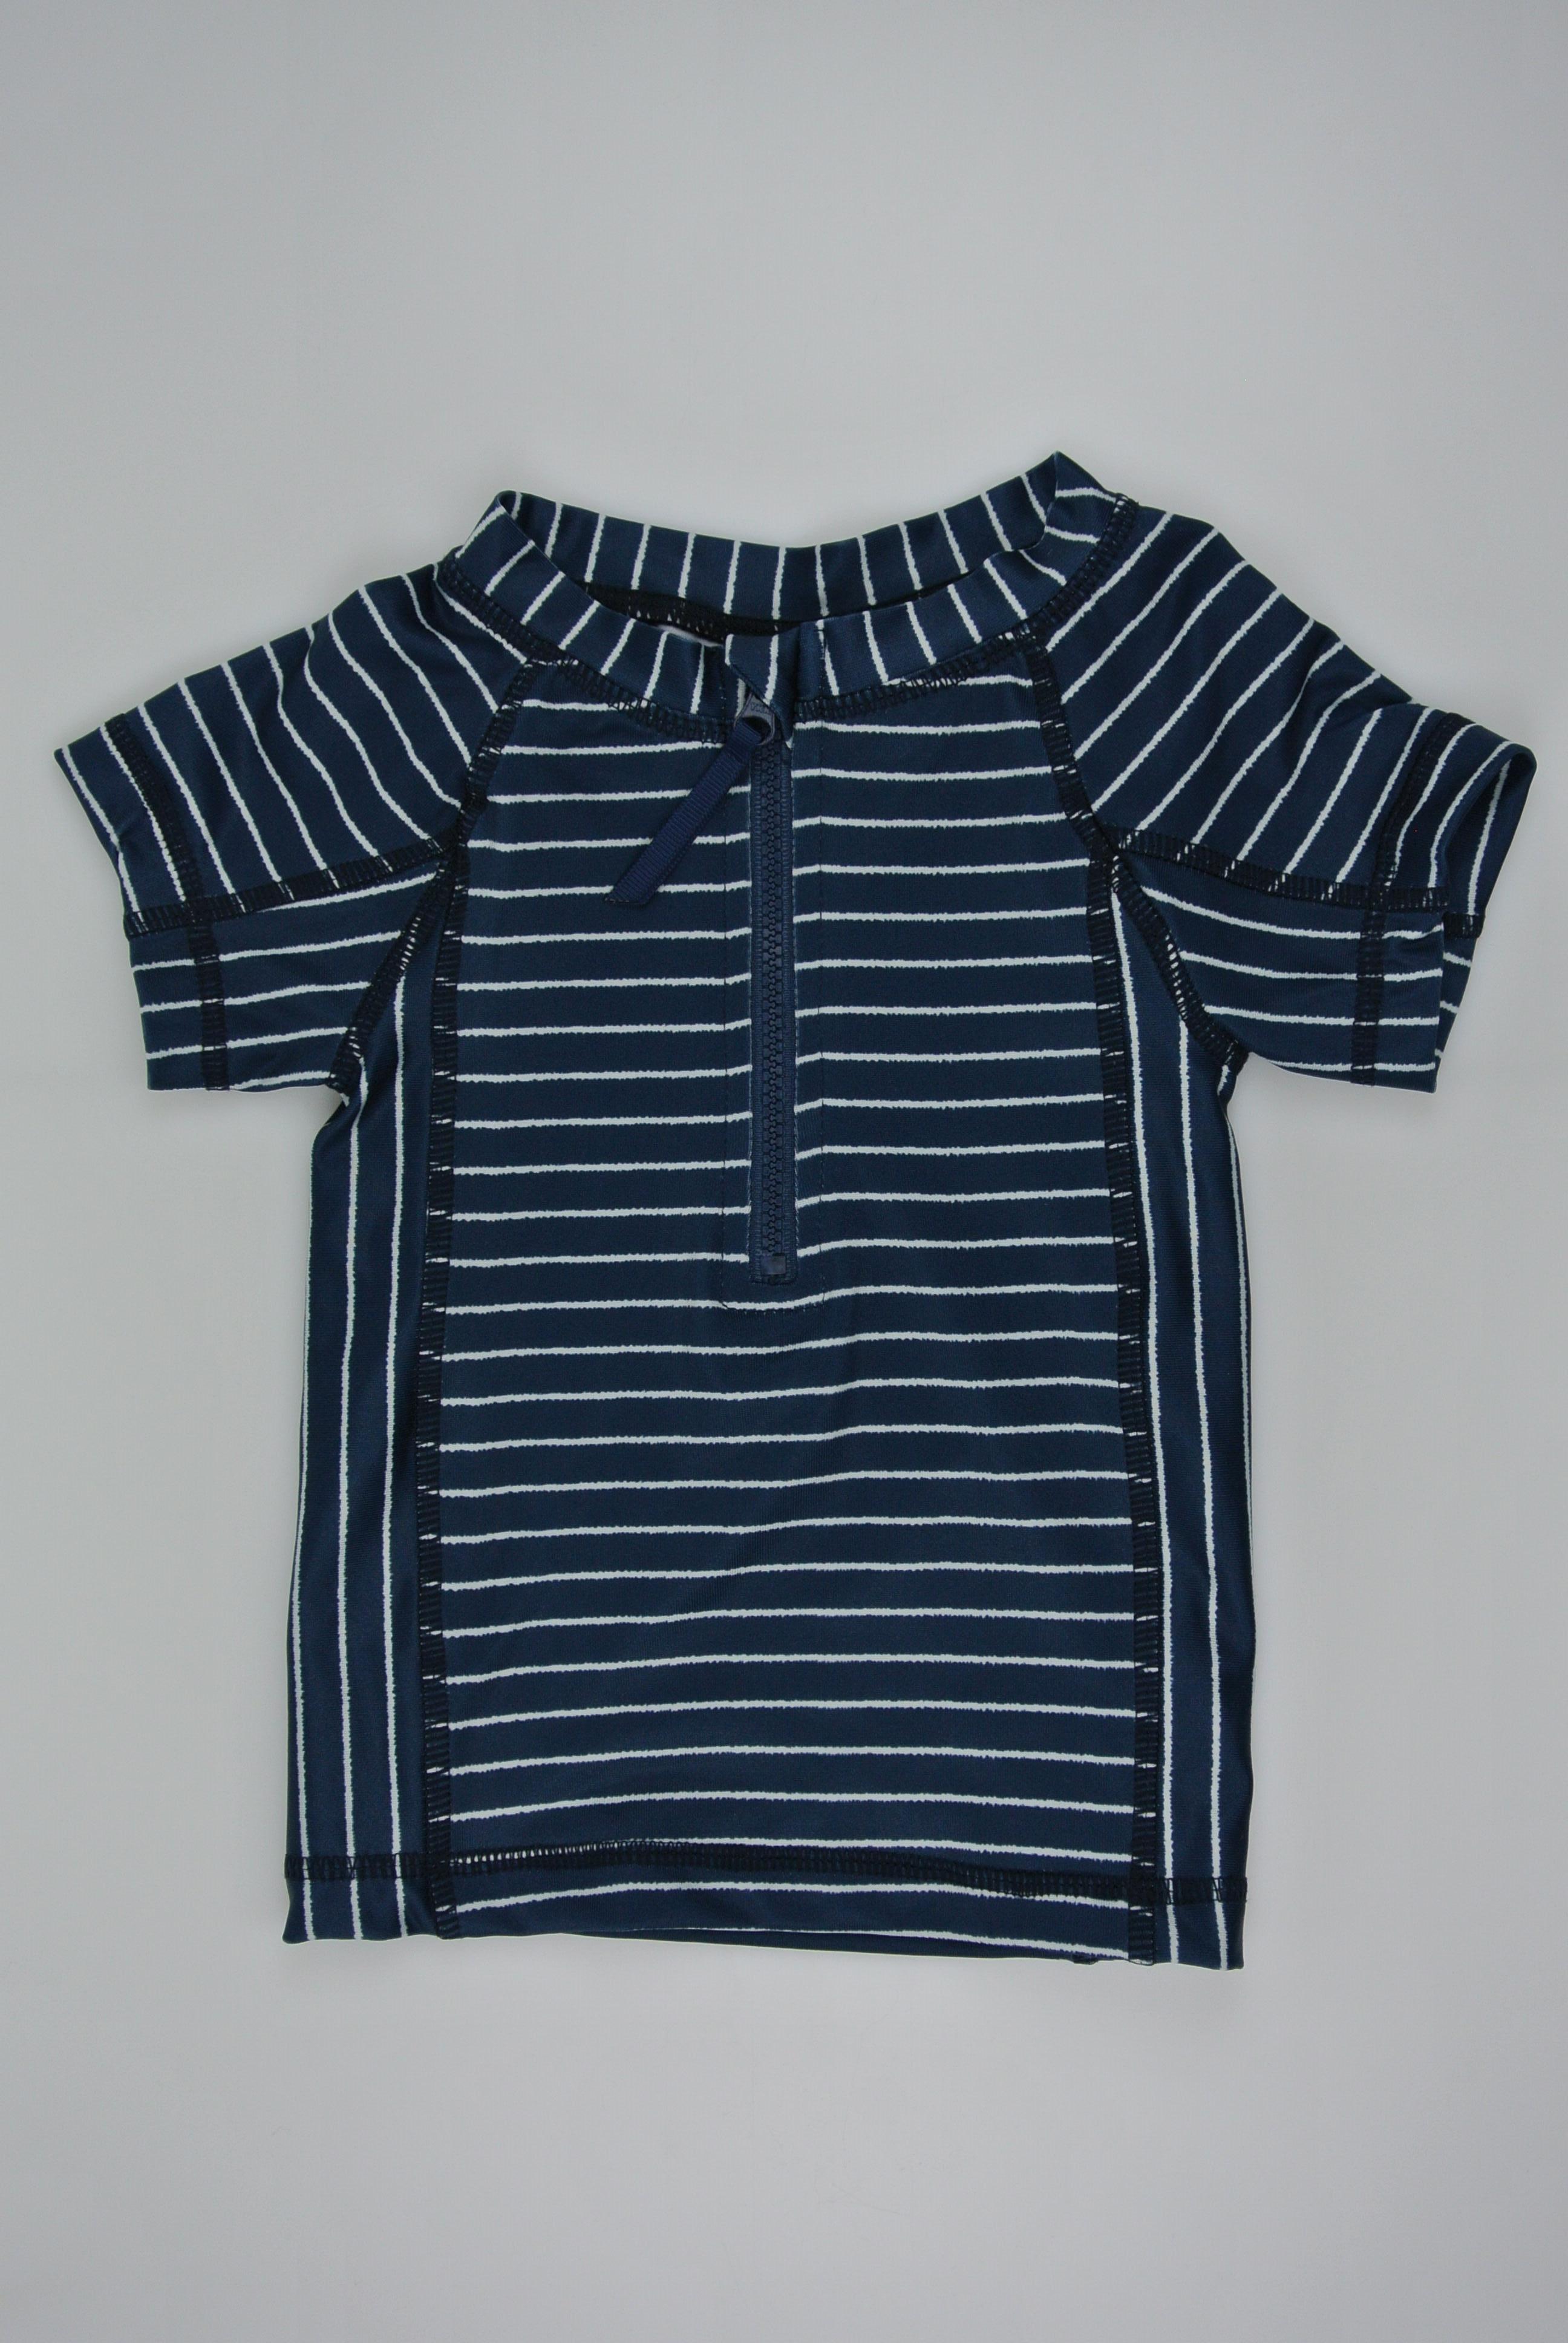 Marmar badetøj str 80 dreng